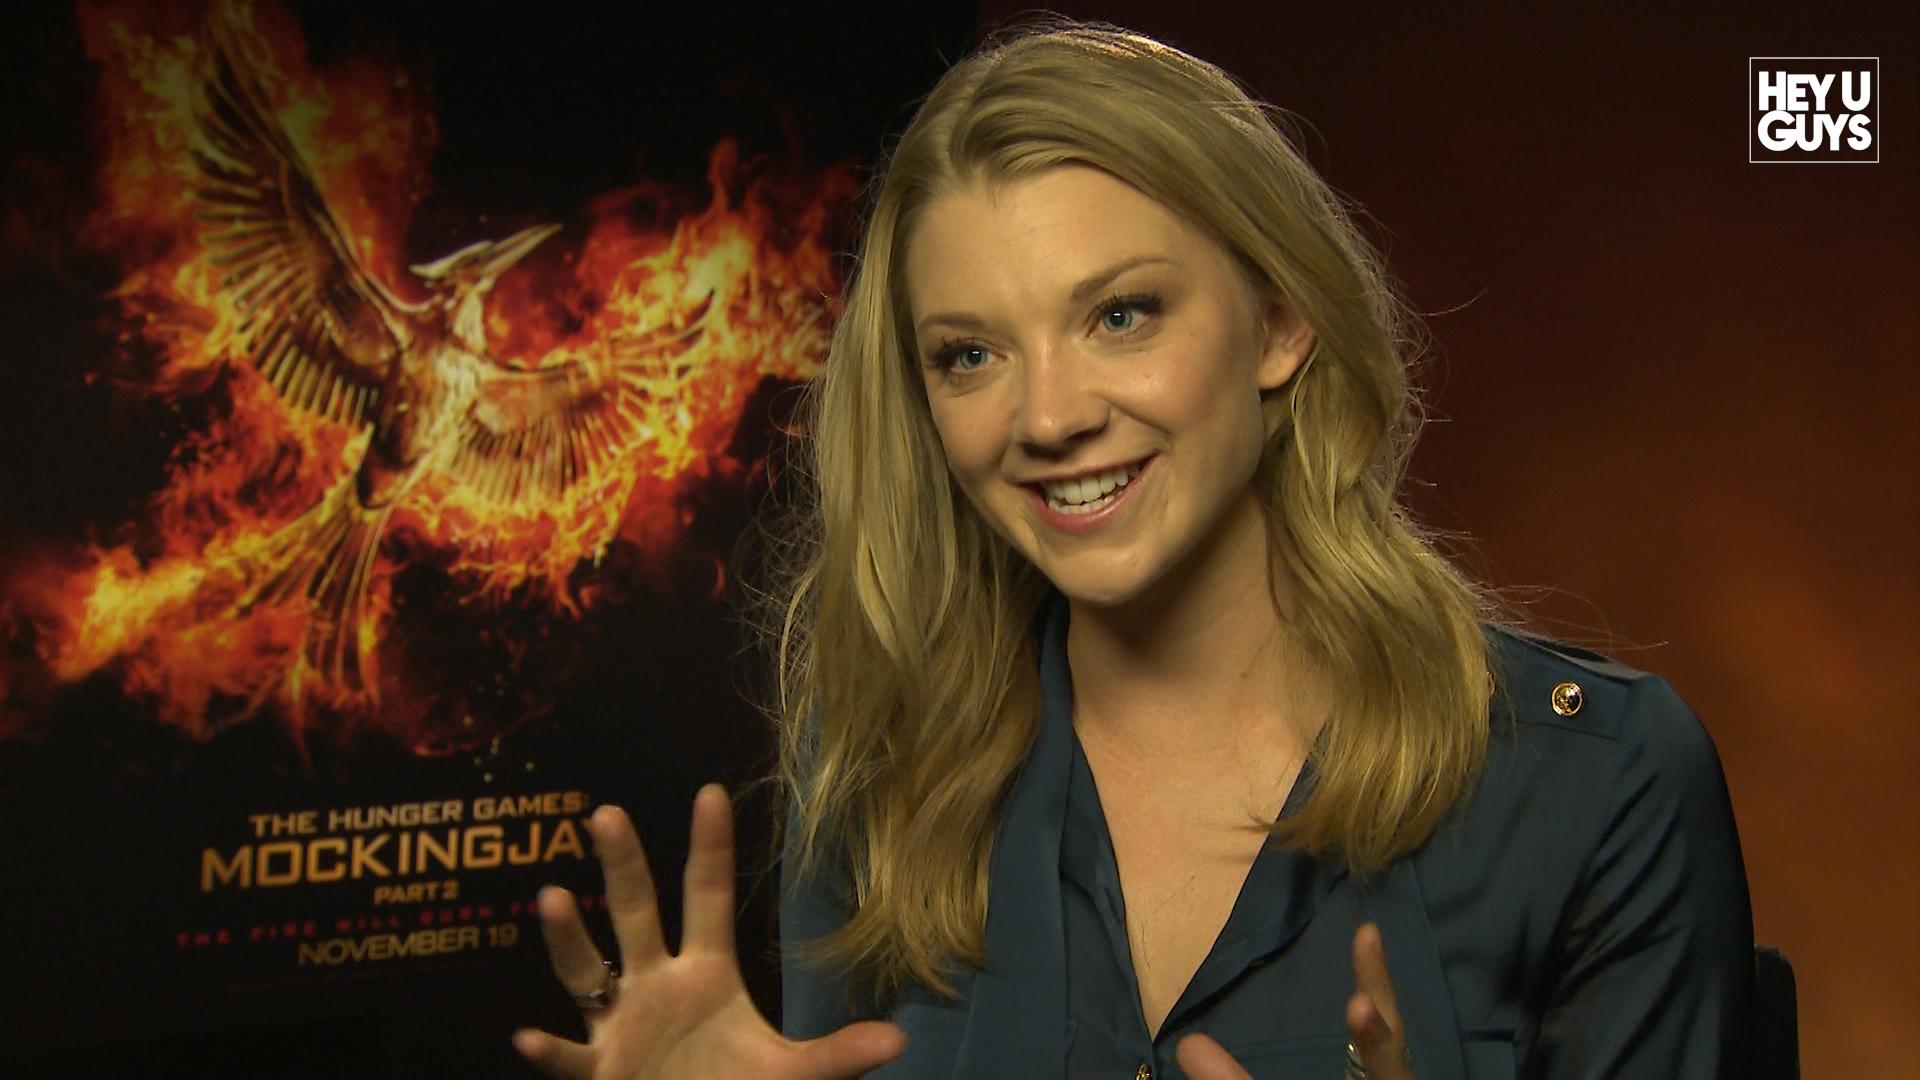 Hunger Games: Mockingjay Star Natalie Dormer Talks